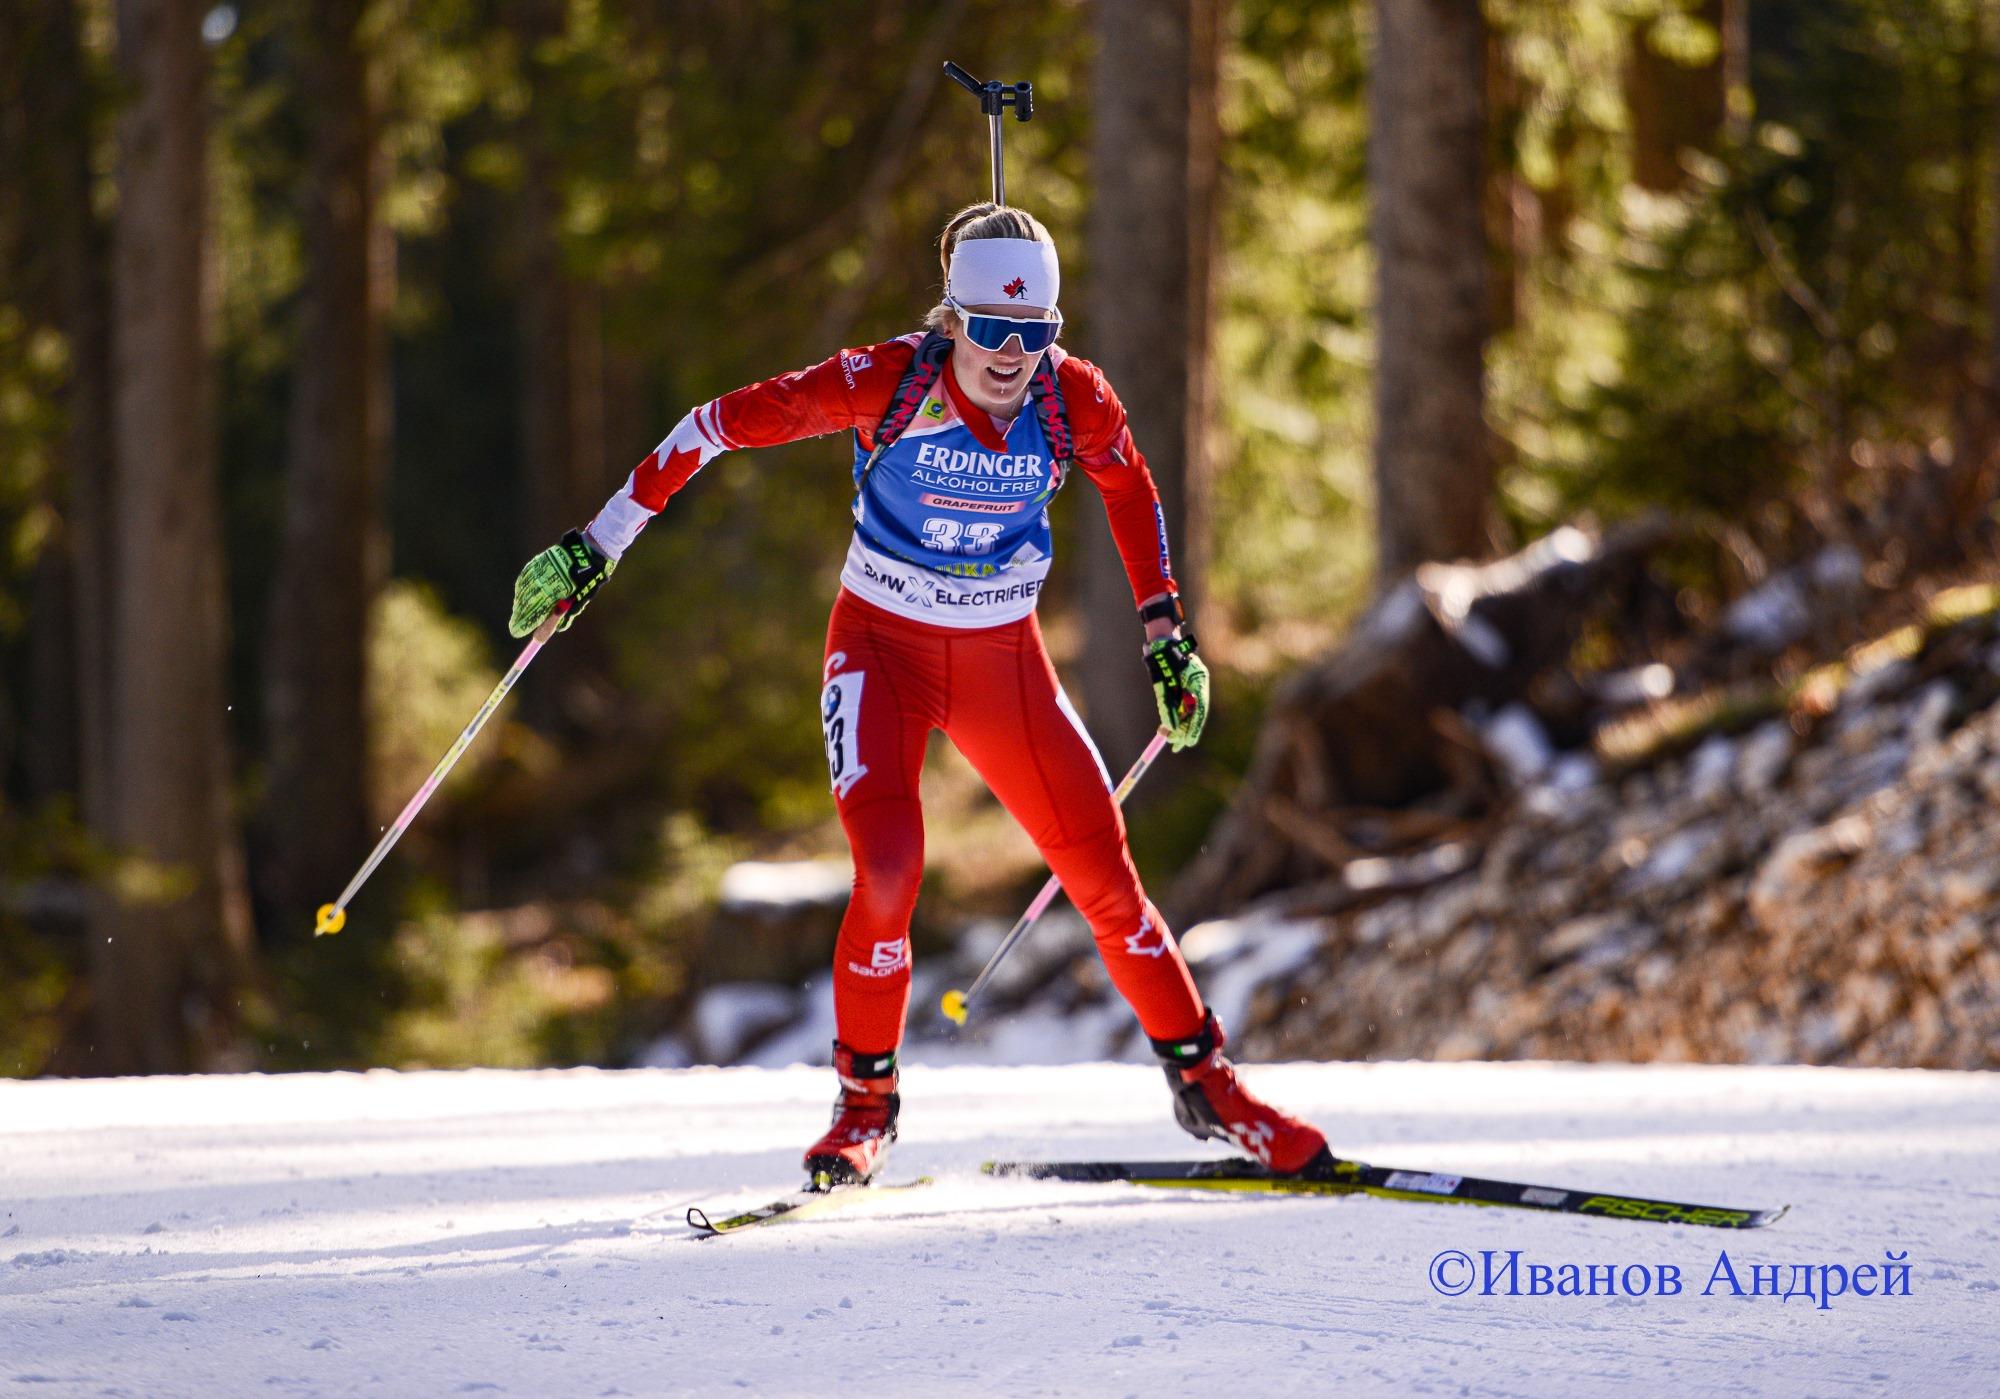 Emma Lunder (photo: Andrei Ivanov)